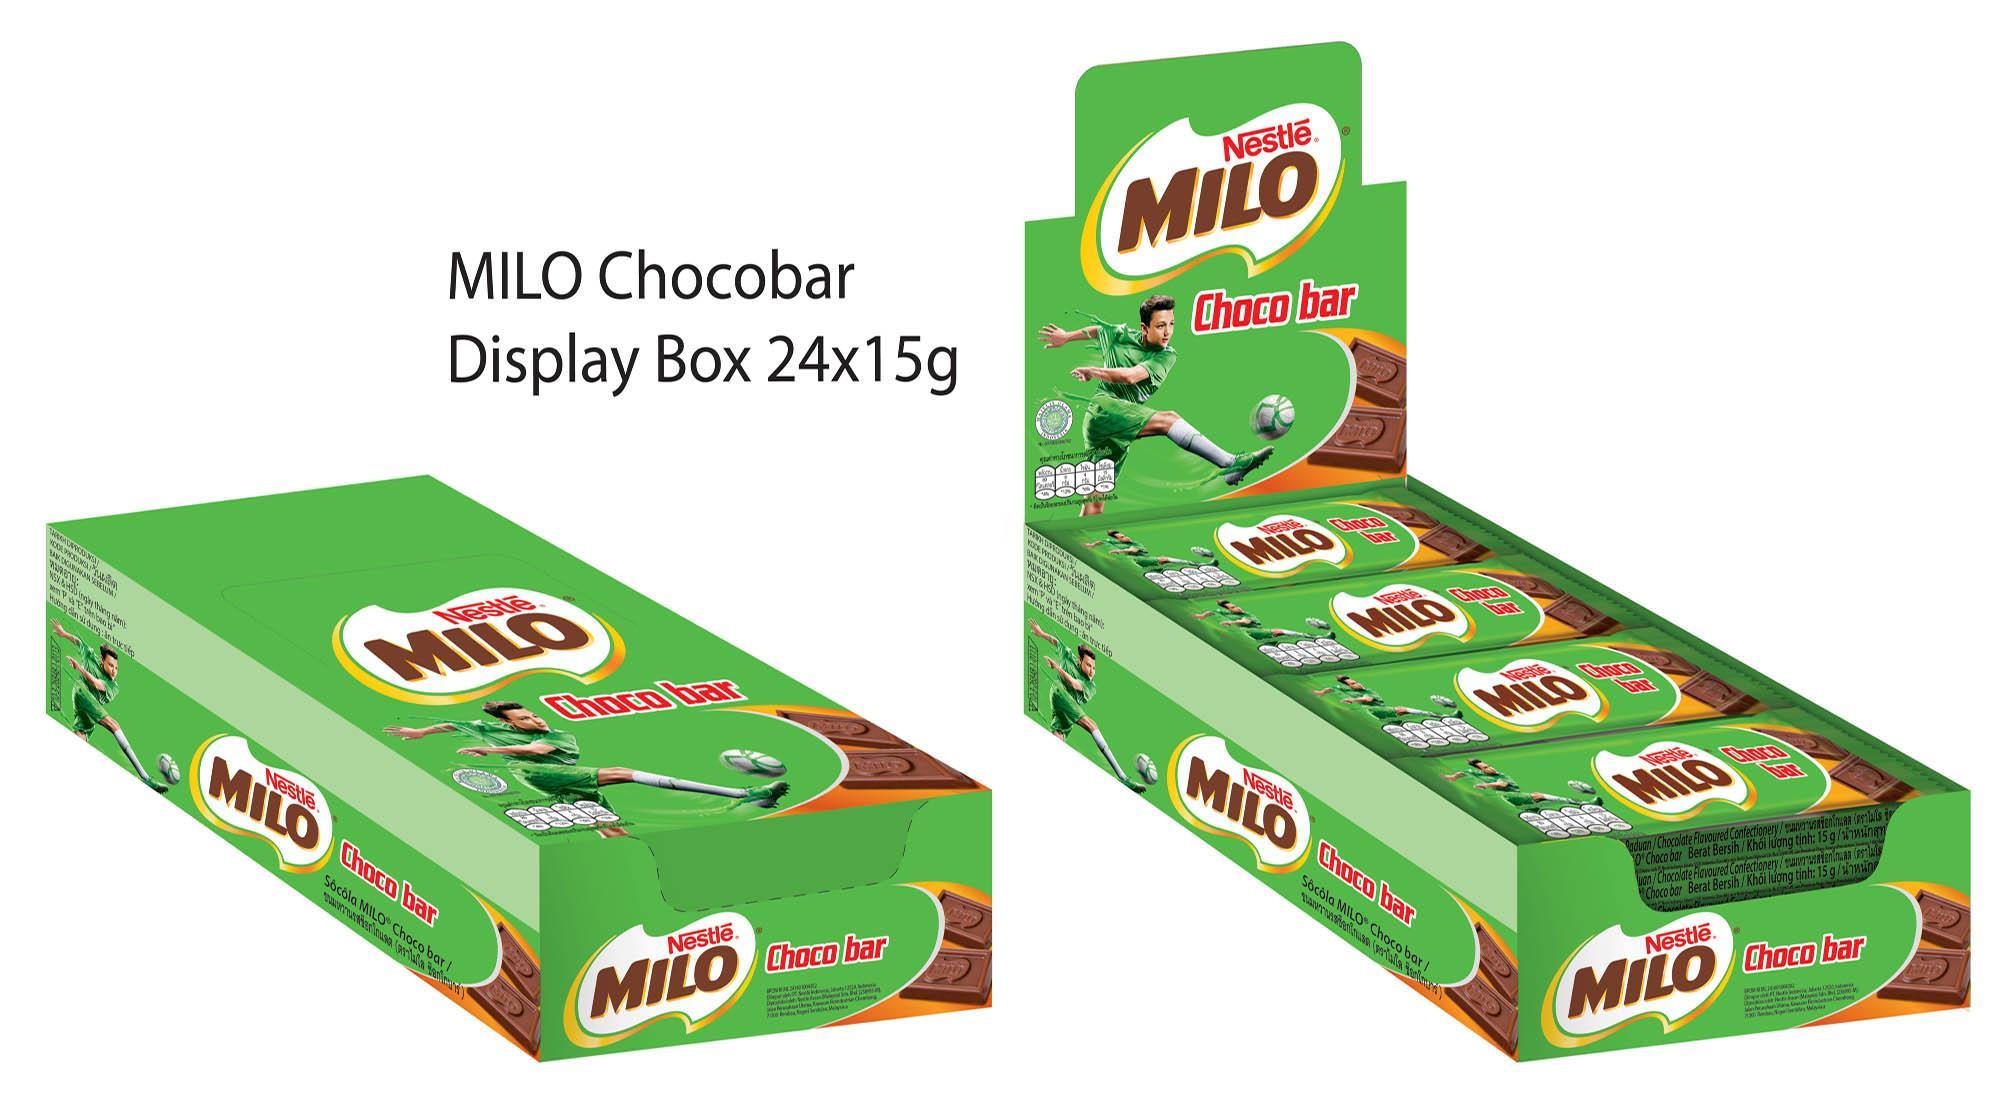 Milo Philippines Price List Nutri Up Chocolate Energy Drink 3in1 Sachet 700gram Chocobar 15g Pack Of 24